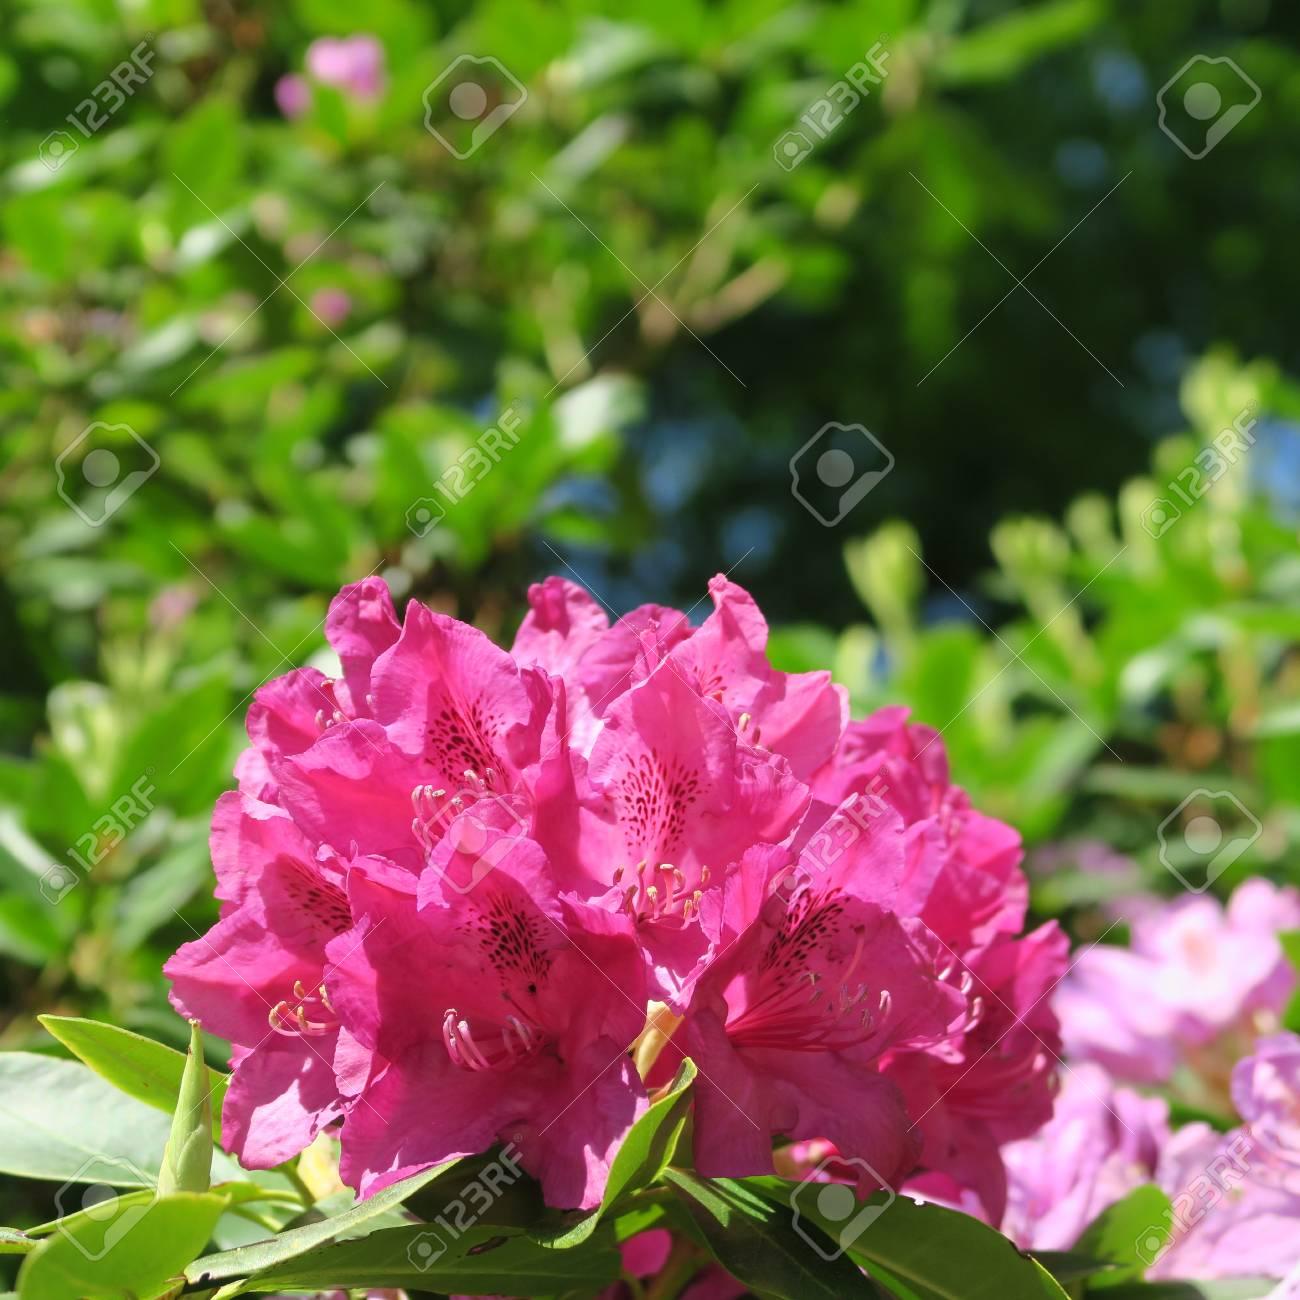 Beautiful big purple flowers on a rhododendron shrub in the spring beautiful big purple flowers on a rhododendron shrub in the spring stock photo 101878314 mightylinksfo